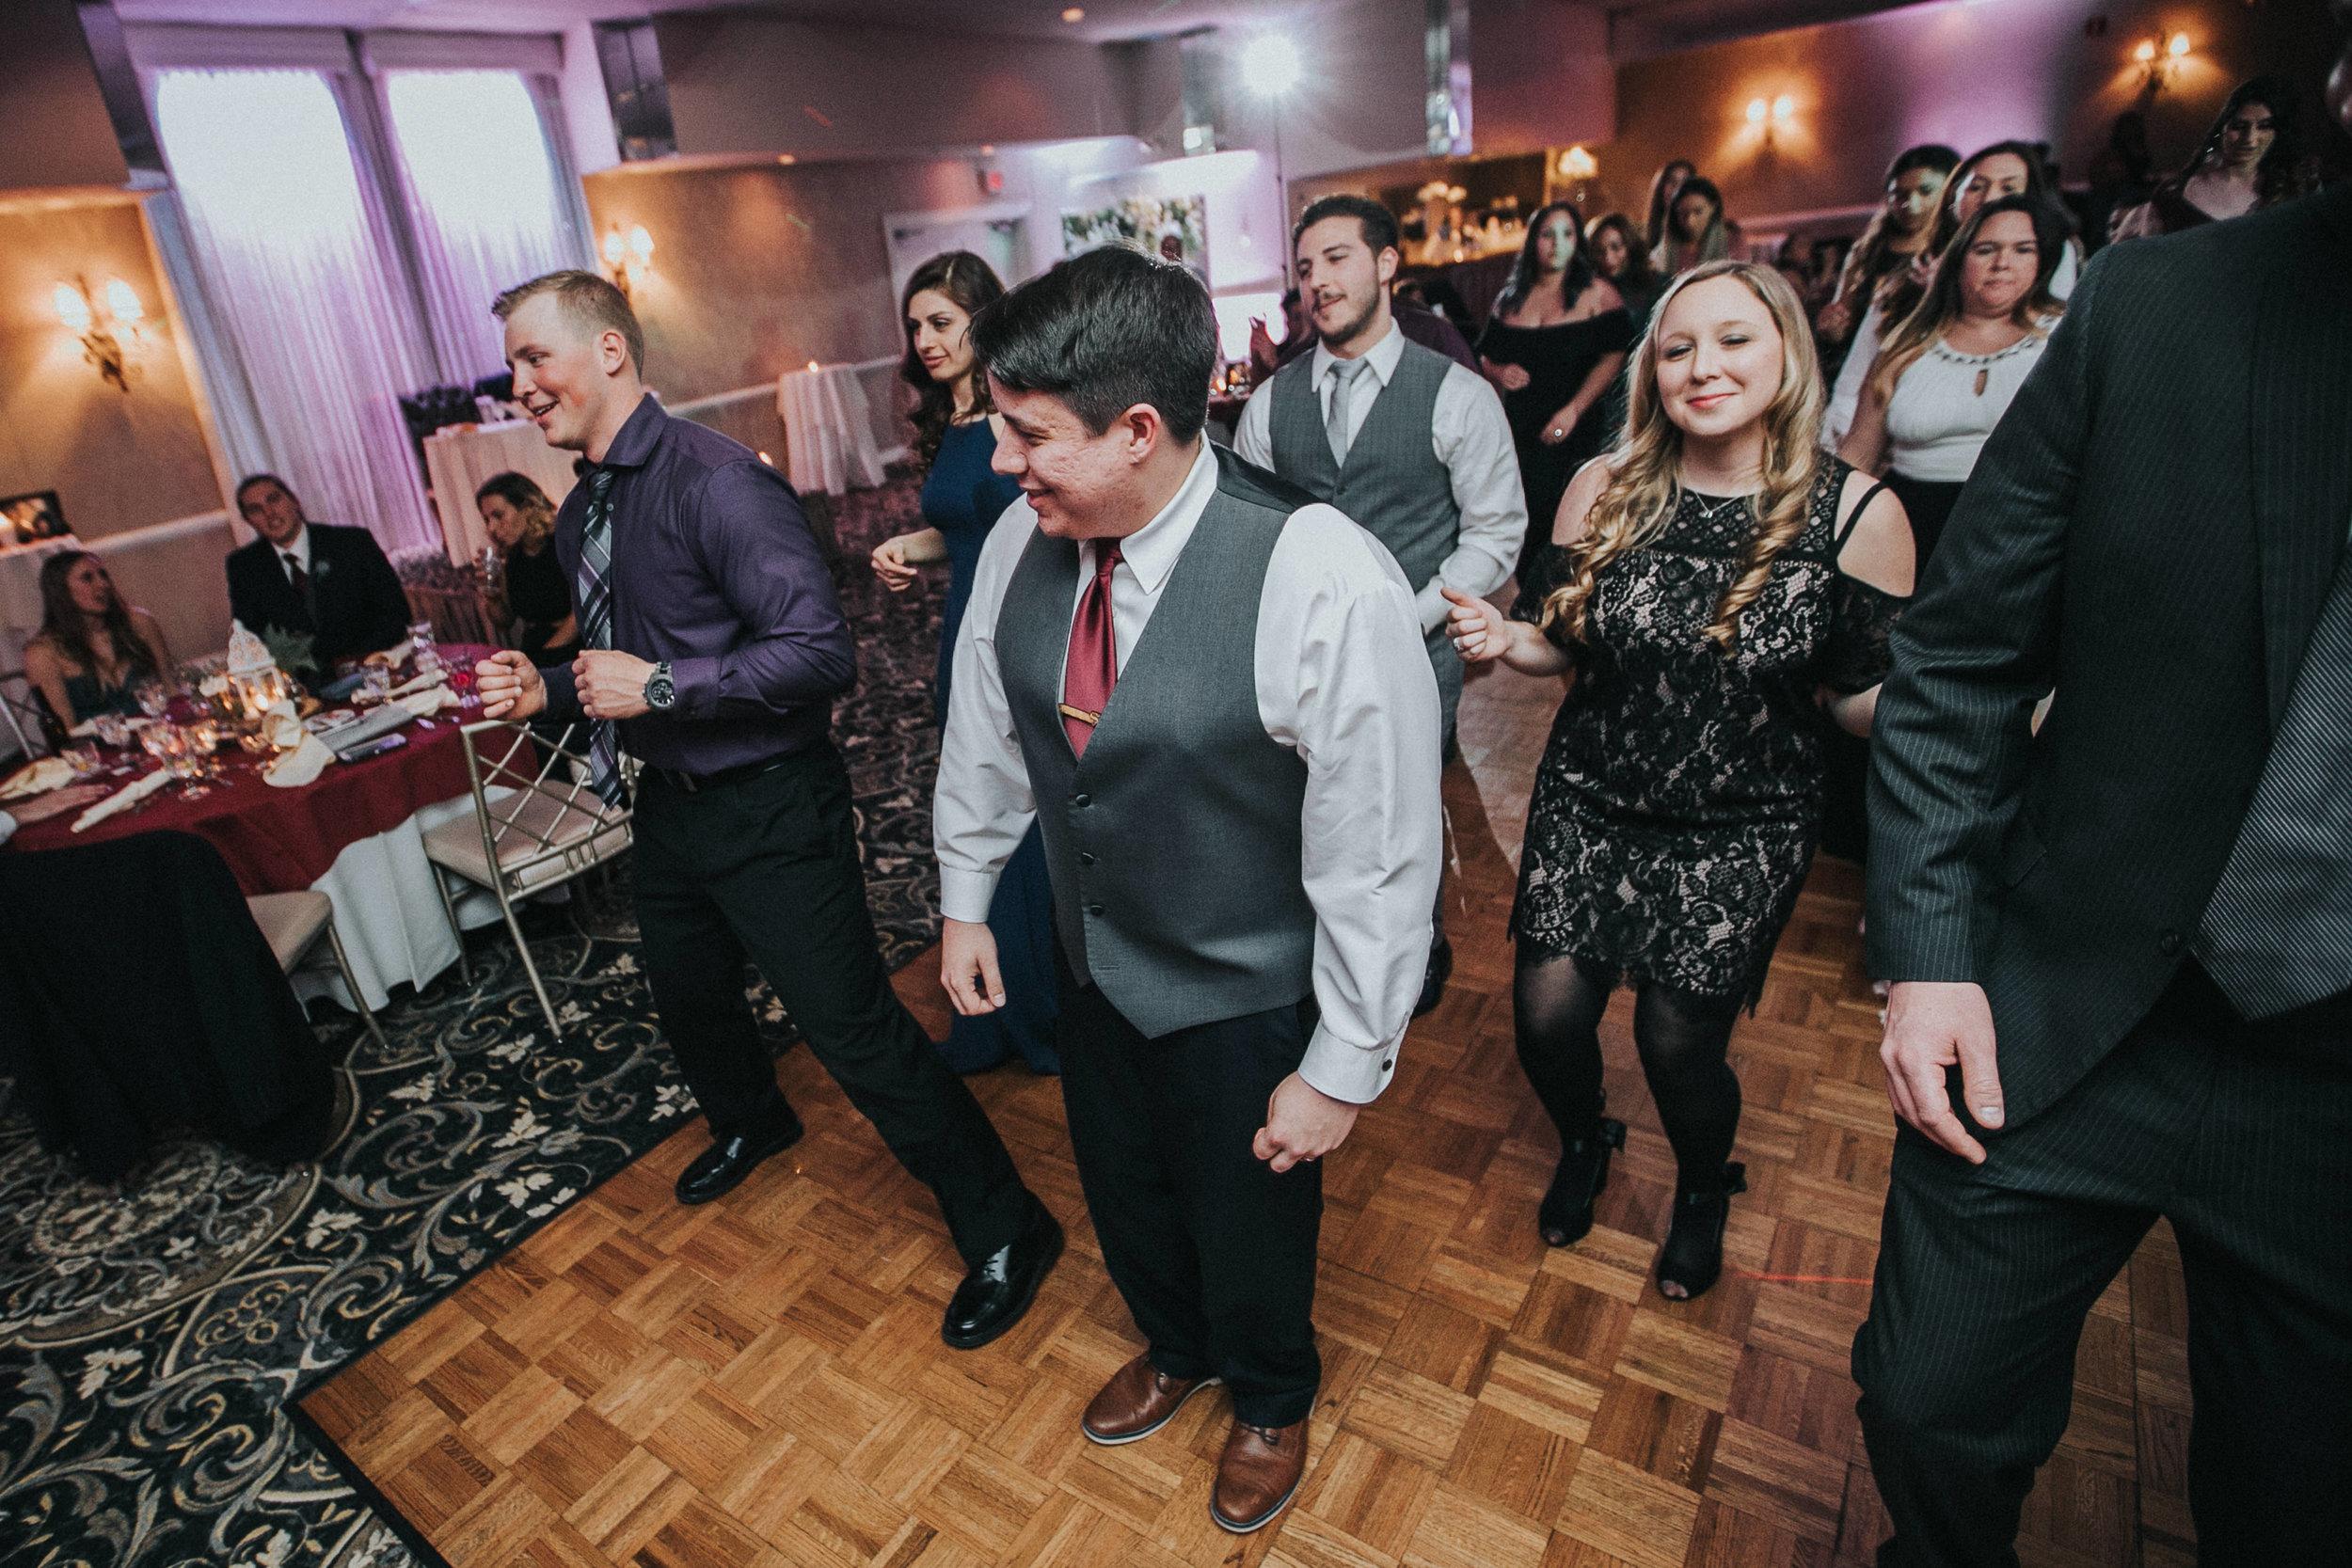 New-Jersey-Wedding-Photographer-ReceptionCenter-Valeria&Mike-Reception (90 of 265).jpg